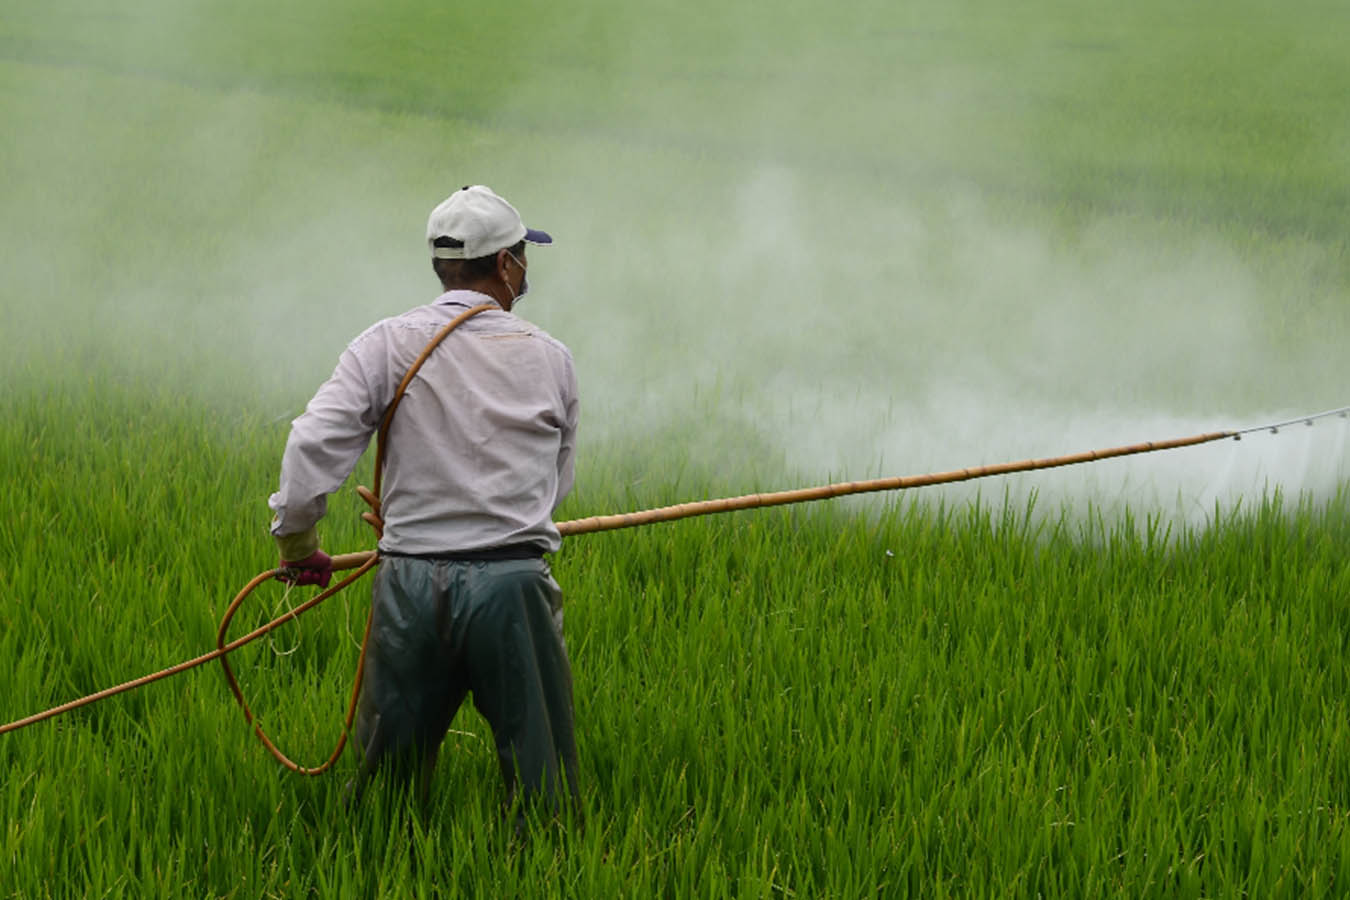 glifosato herbicida pesticida maiz gmo corn maiz transgenico